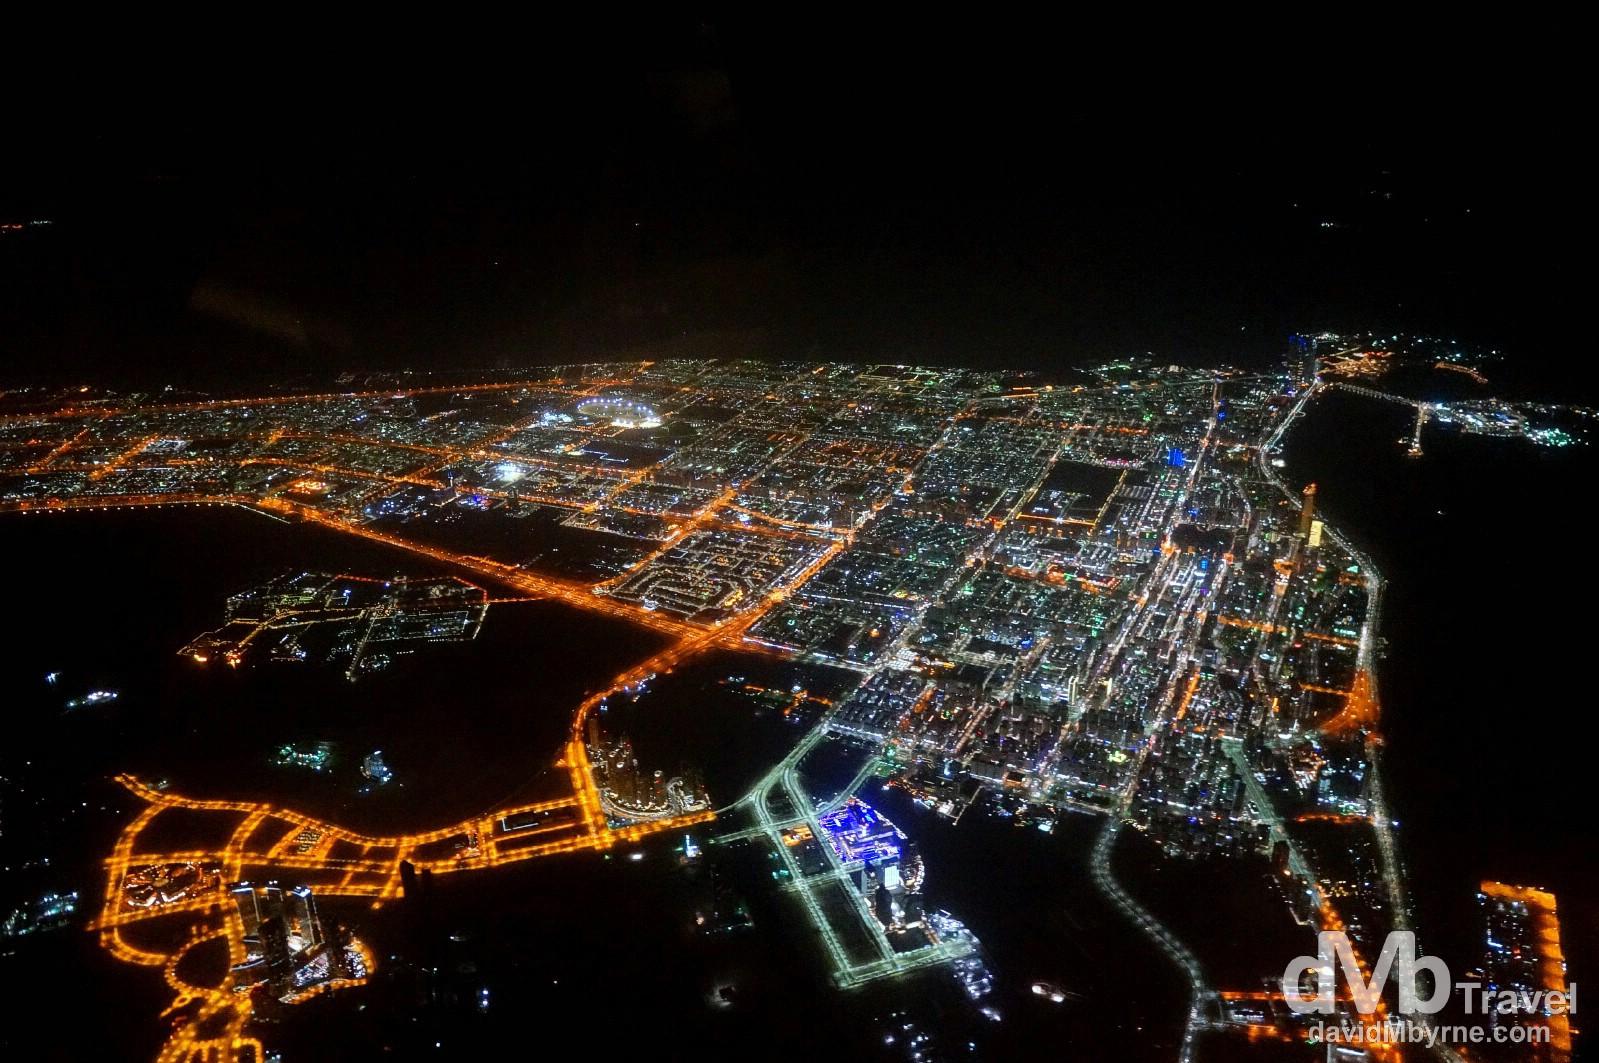 Abu Dhabi, UAE, as seen from Rotana Jet flight RG125 en route to Muscat, Oman. April 24th, 2014.